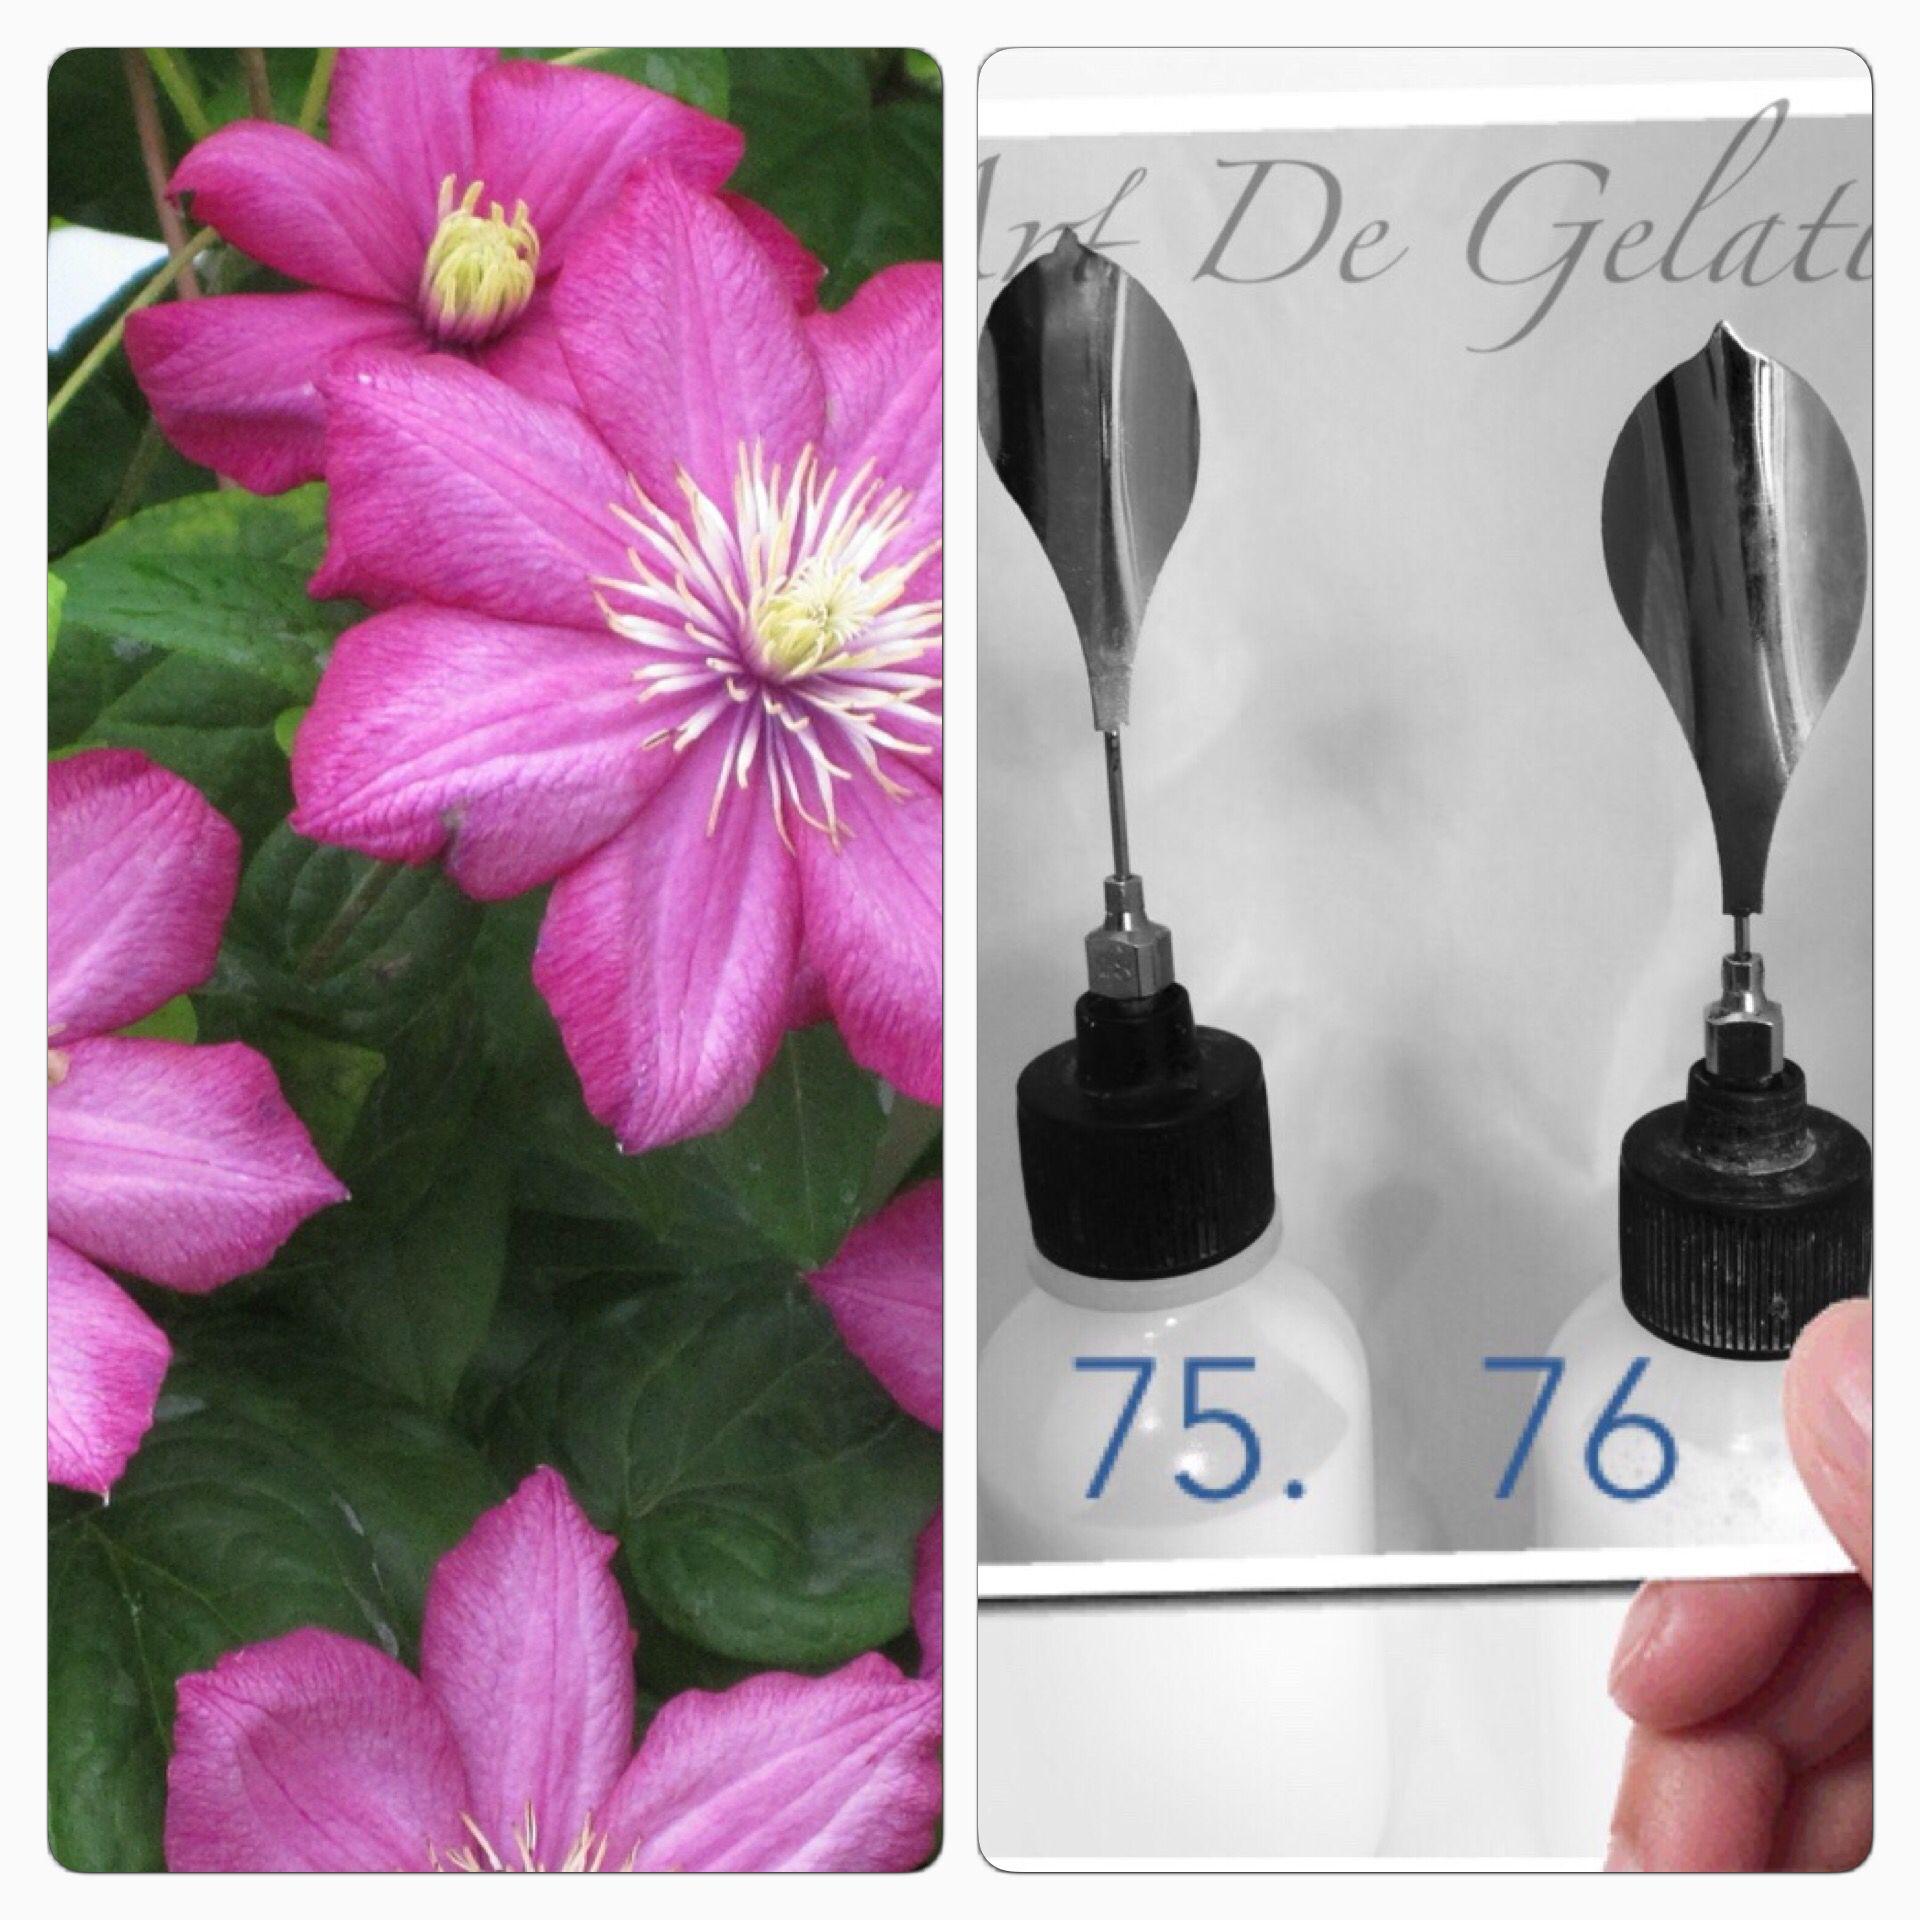 Pin By Art De Gelatin 3d Edible Gelatin Art On Gelatin Art Tools